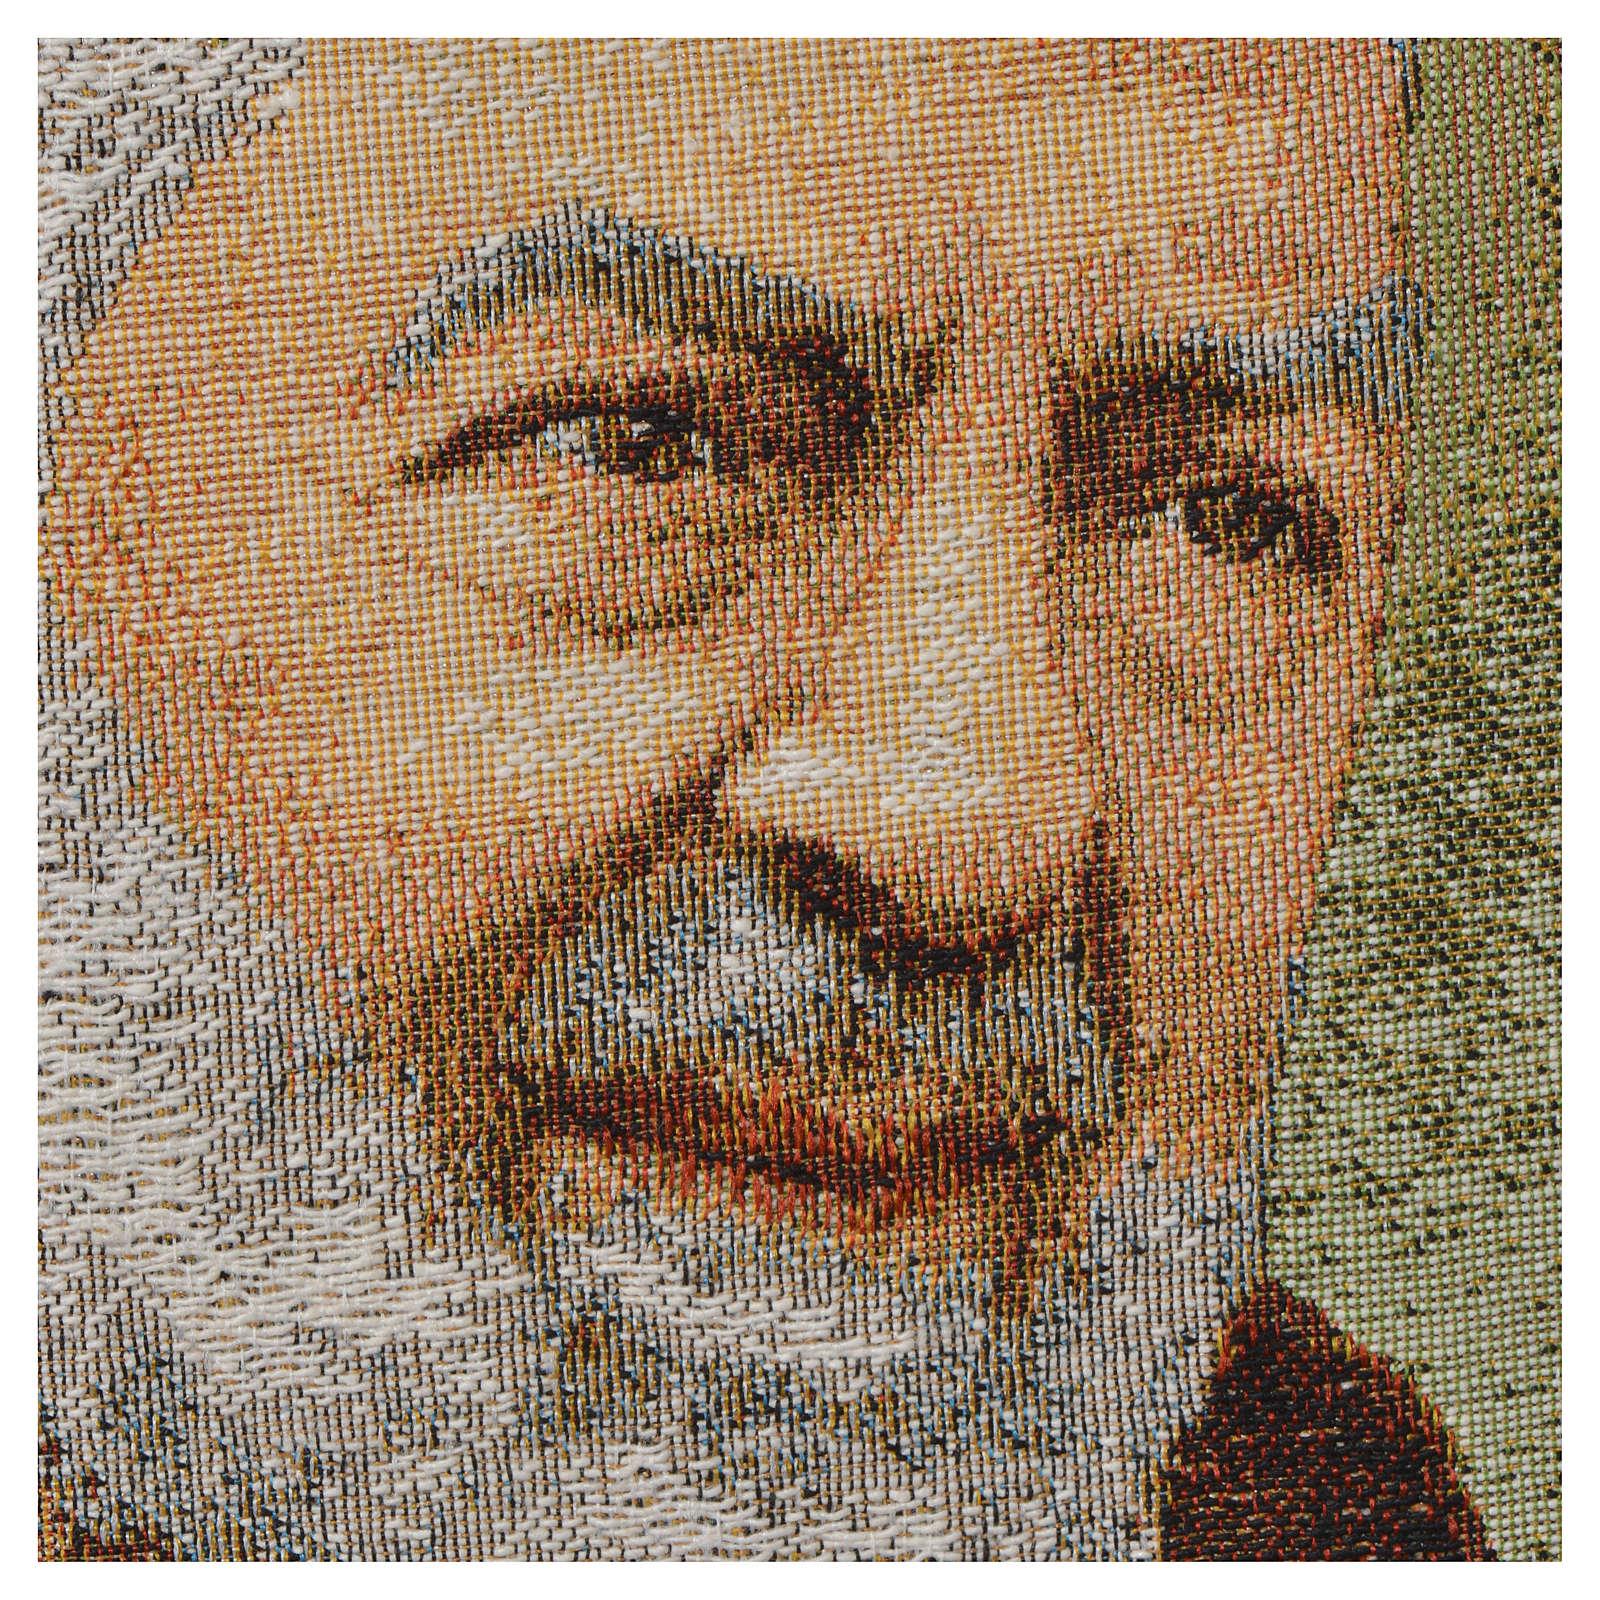 Tapestry Padre Pio 3